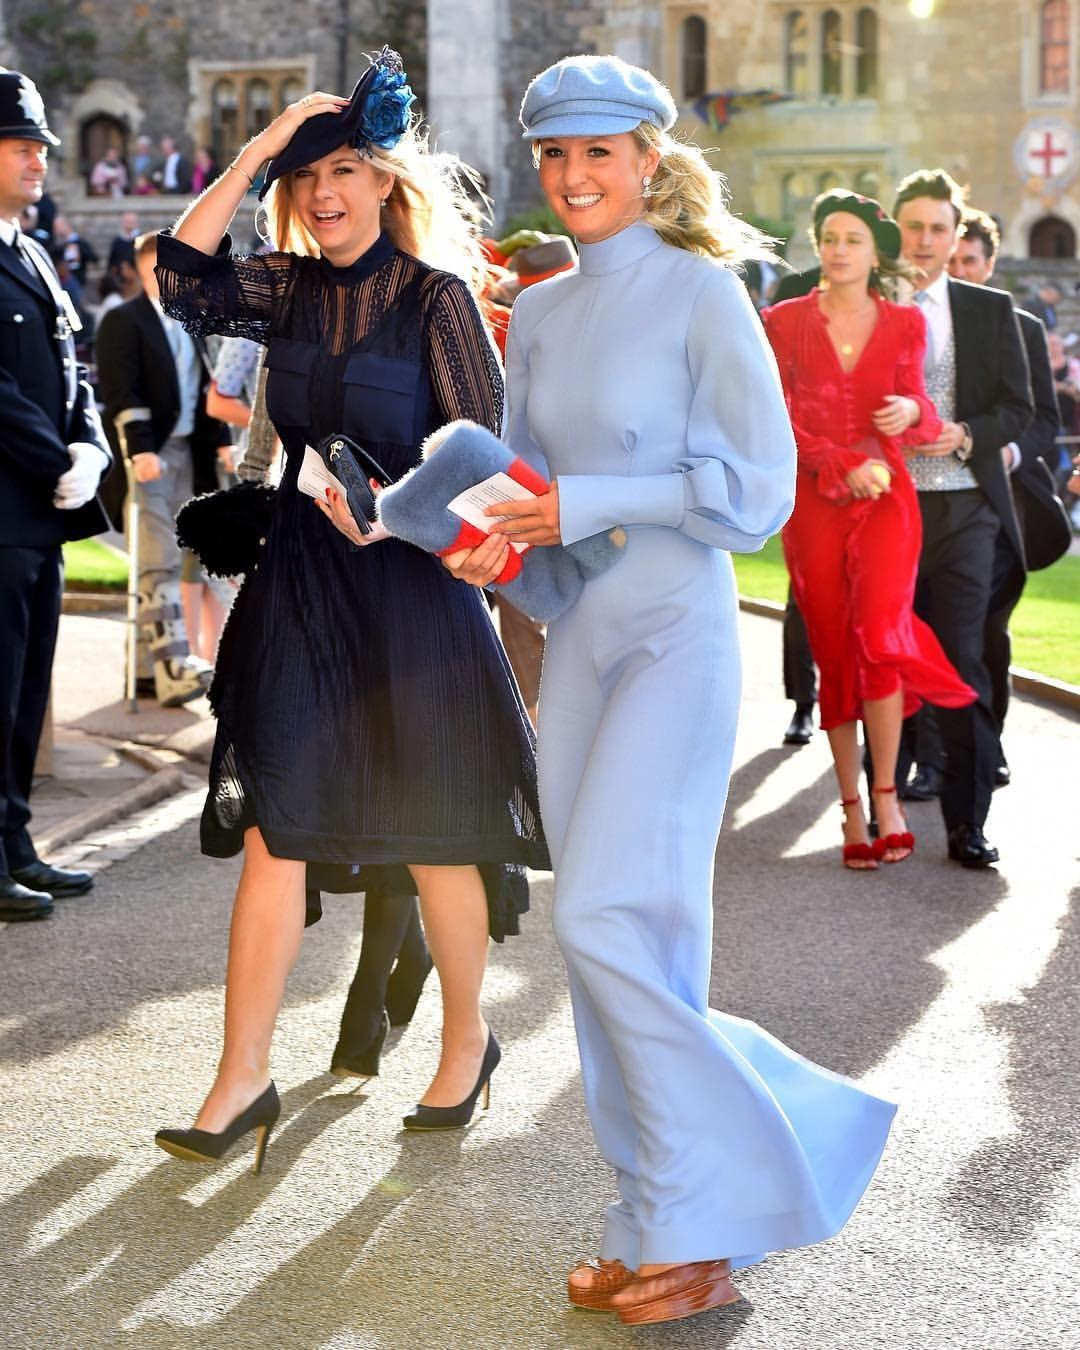 Blimey! Prince Harry's Ex-girlfriend, Chelsy Davy, Showed